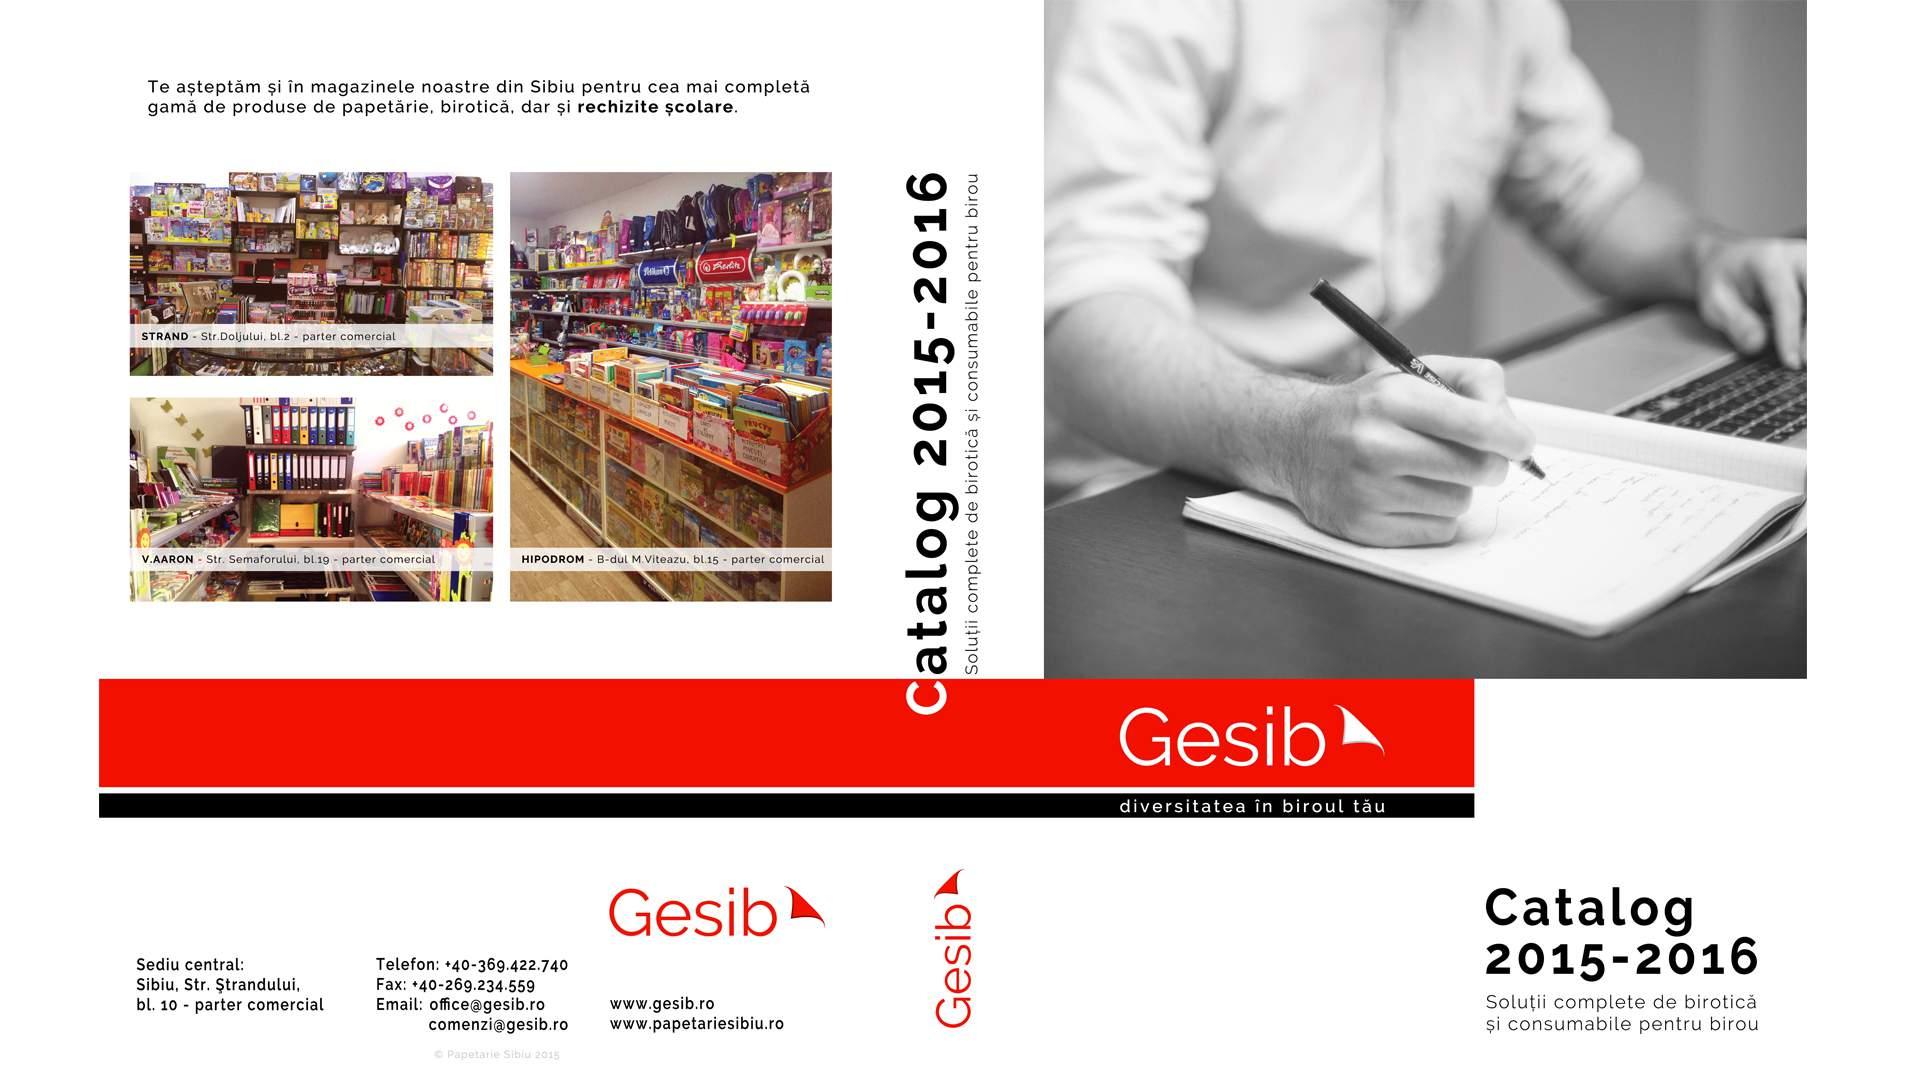 gesib-catalog-branding